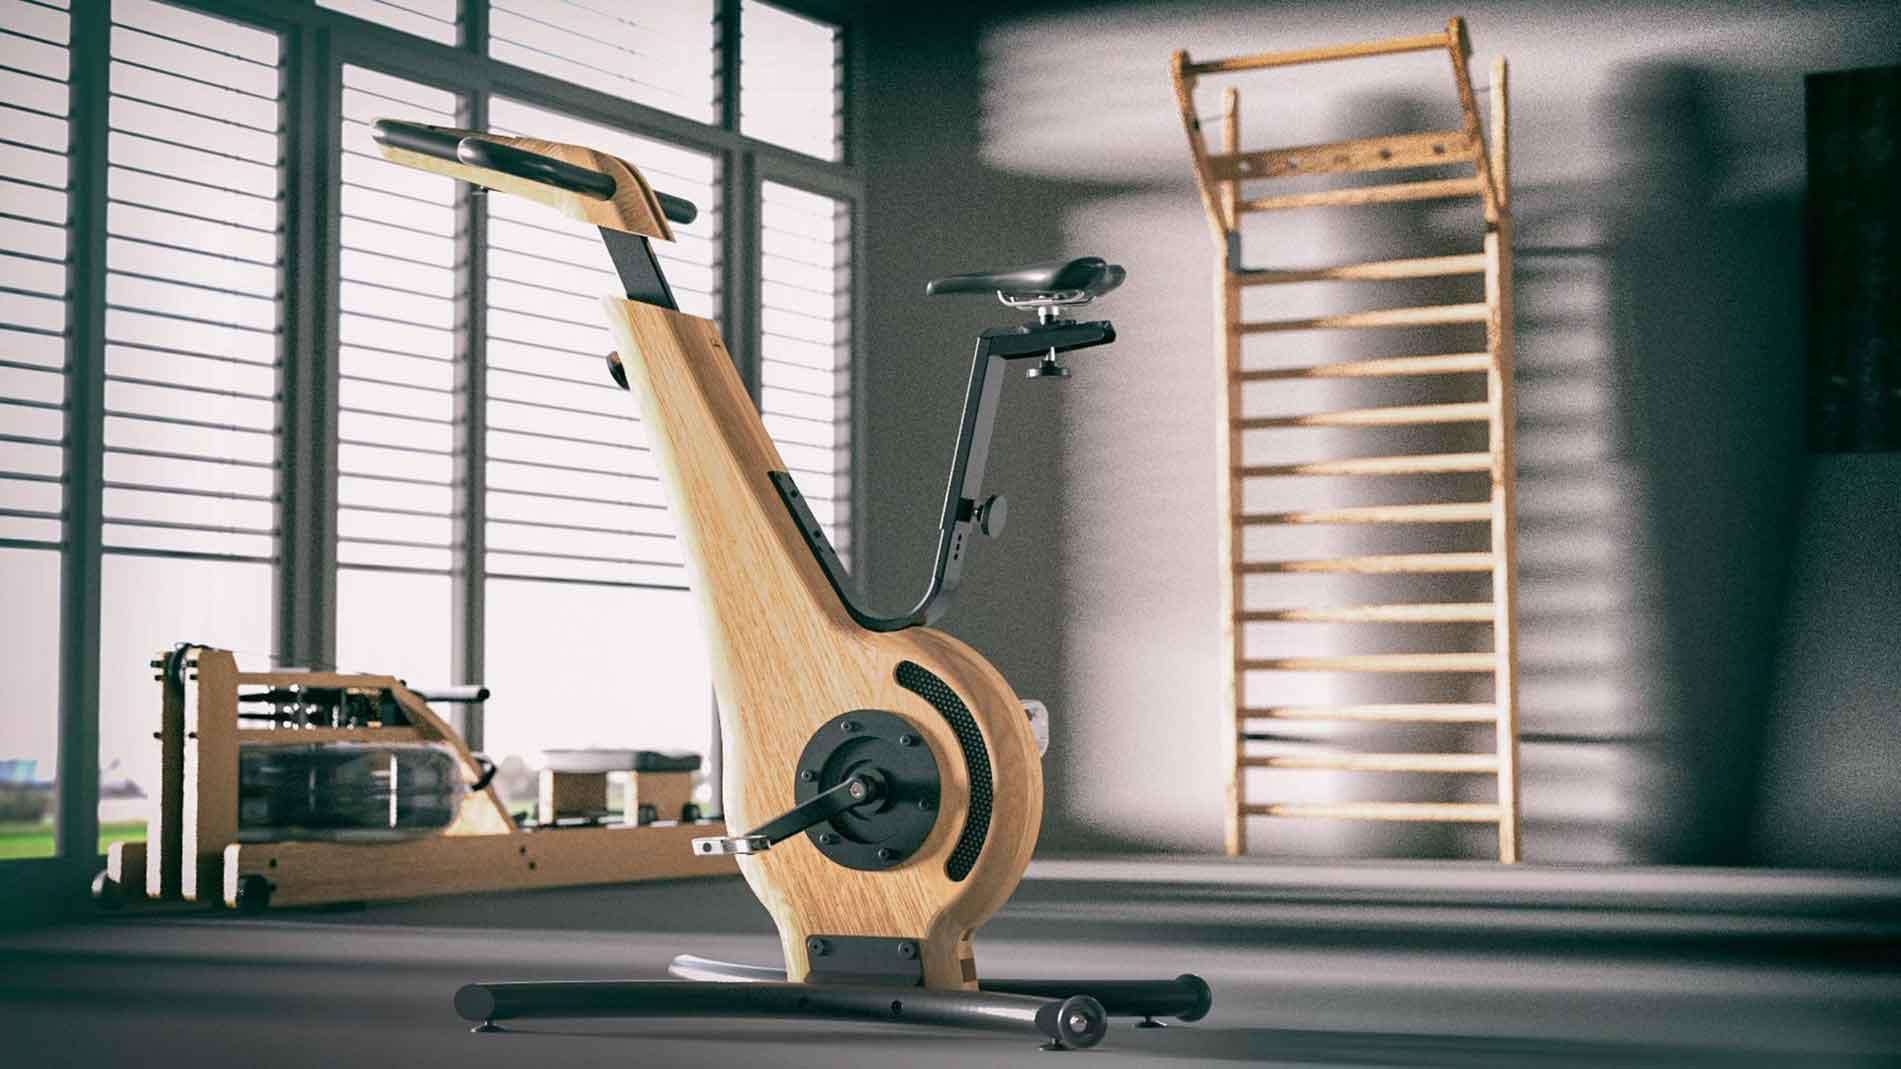 jk sportvertrieb profi shop nohrd bike eiche zum top preis. Black Bedroom Furniture Sets. Home Design Ideas